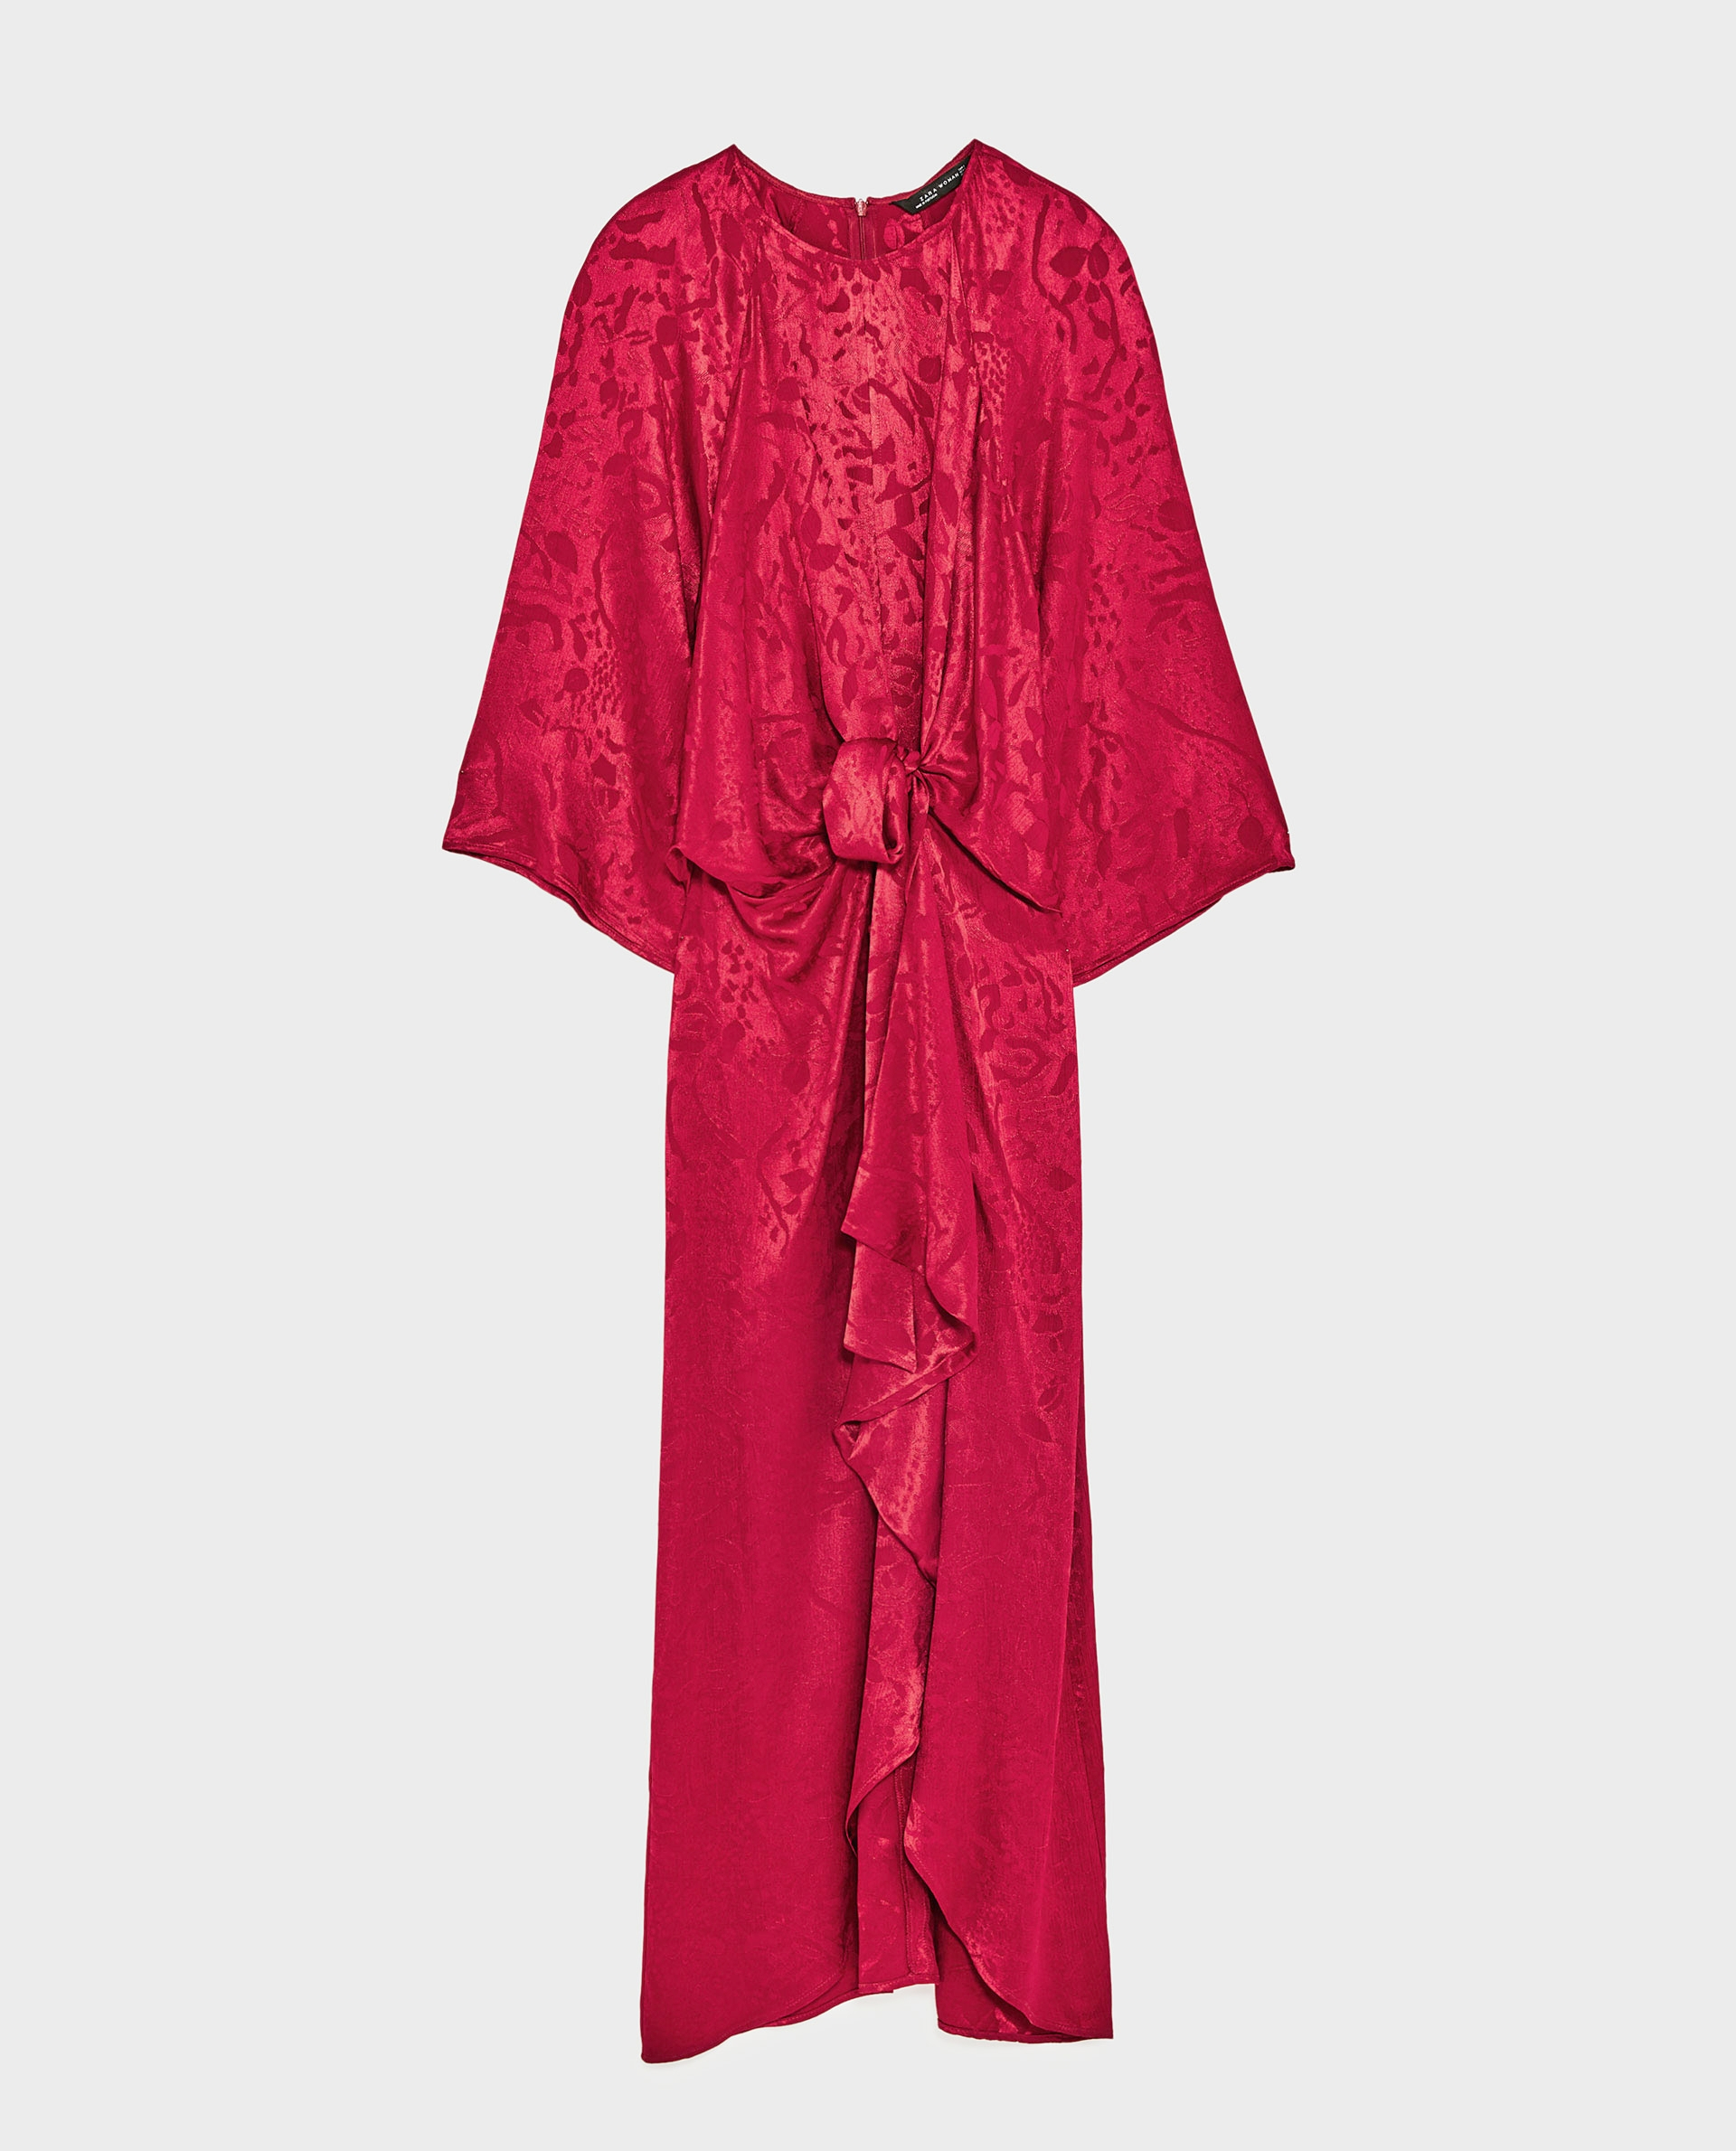 Dress, £69.99, Zara